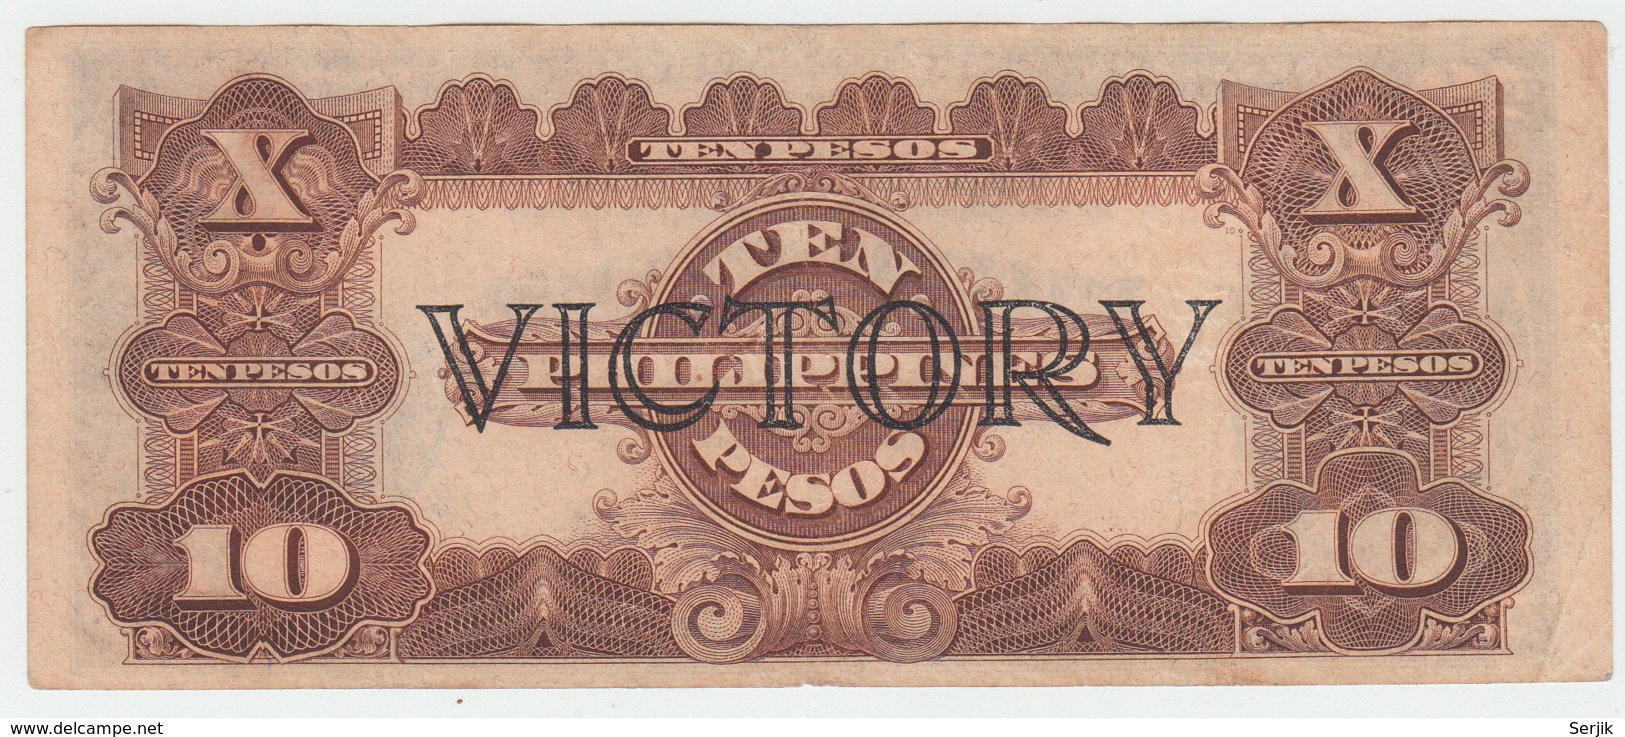 Philippines 10 Pesos 1944 AVF+ CRISP Banknote Pick 97 - Philippines